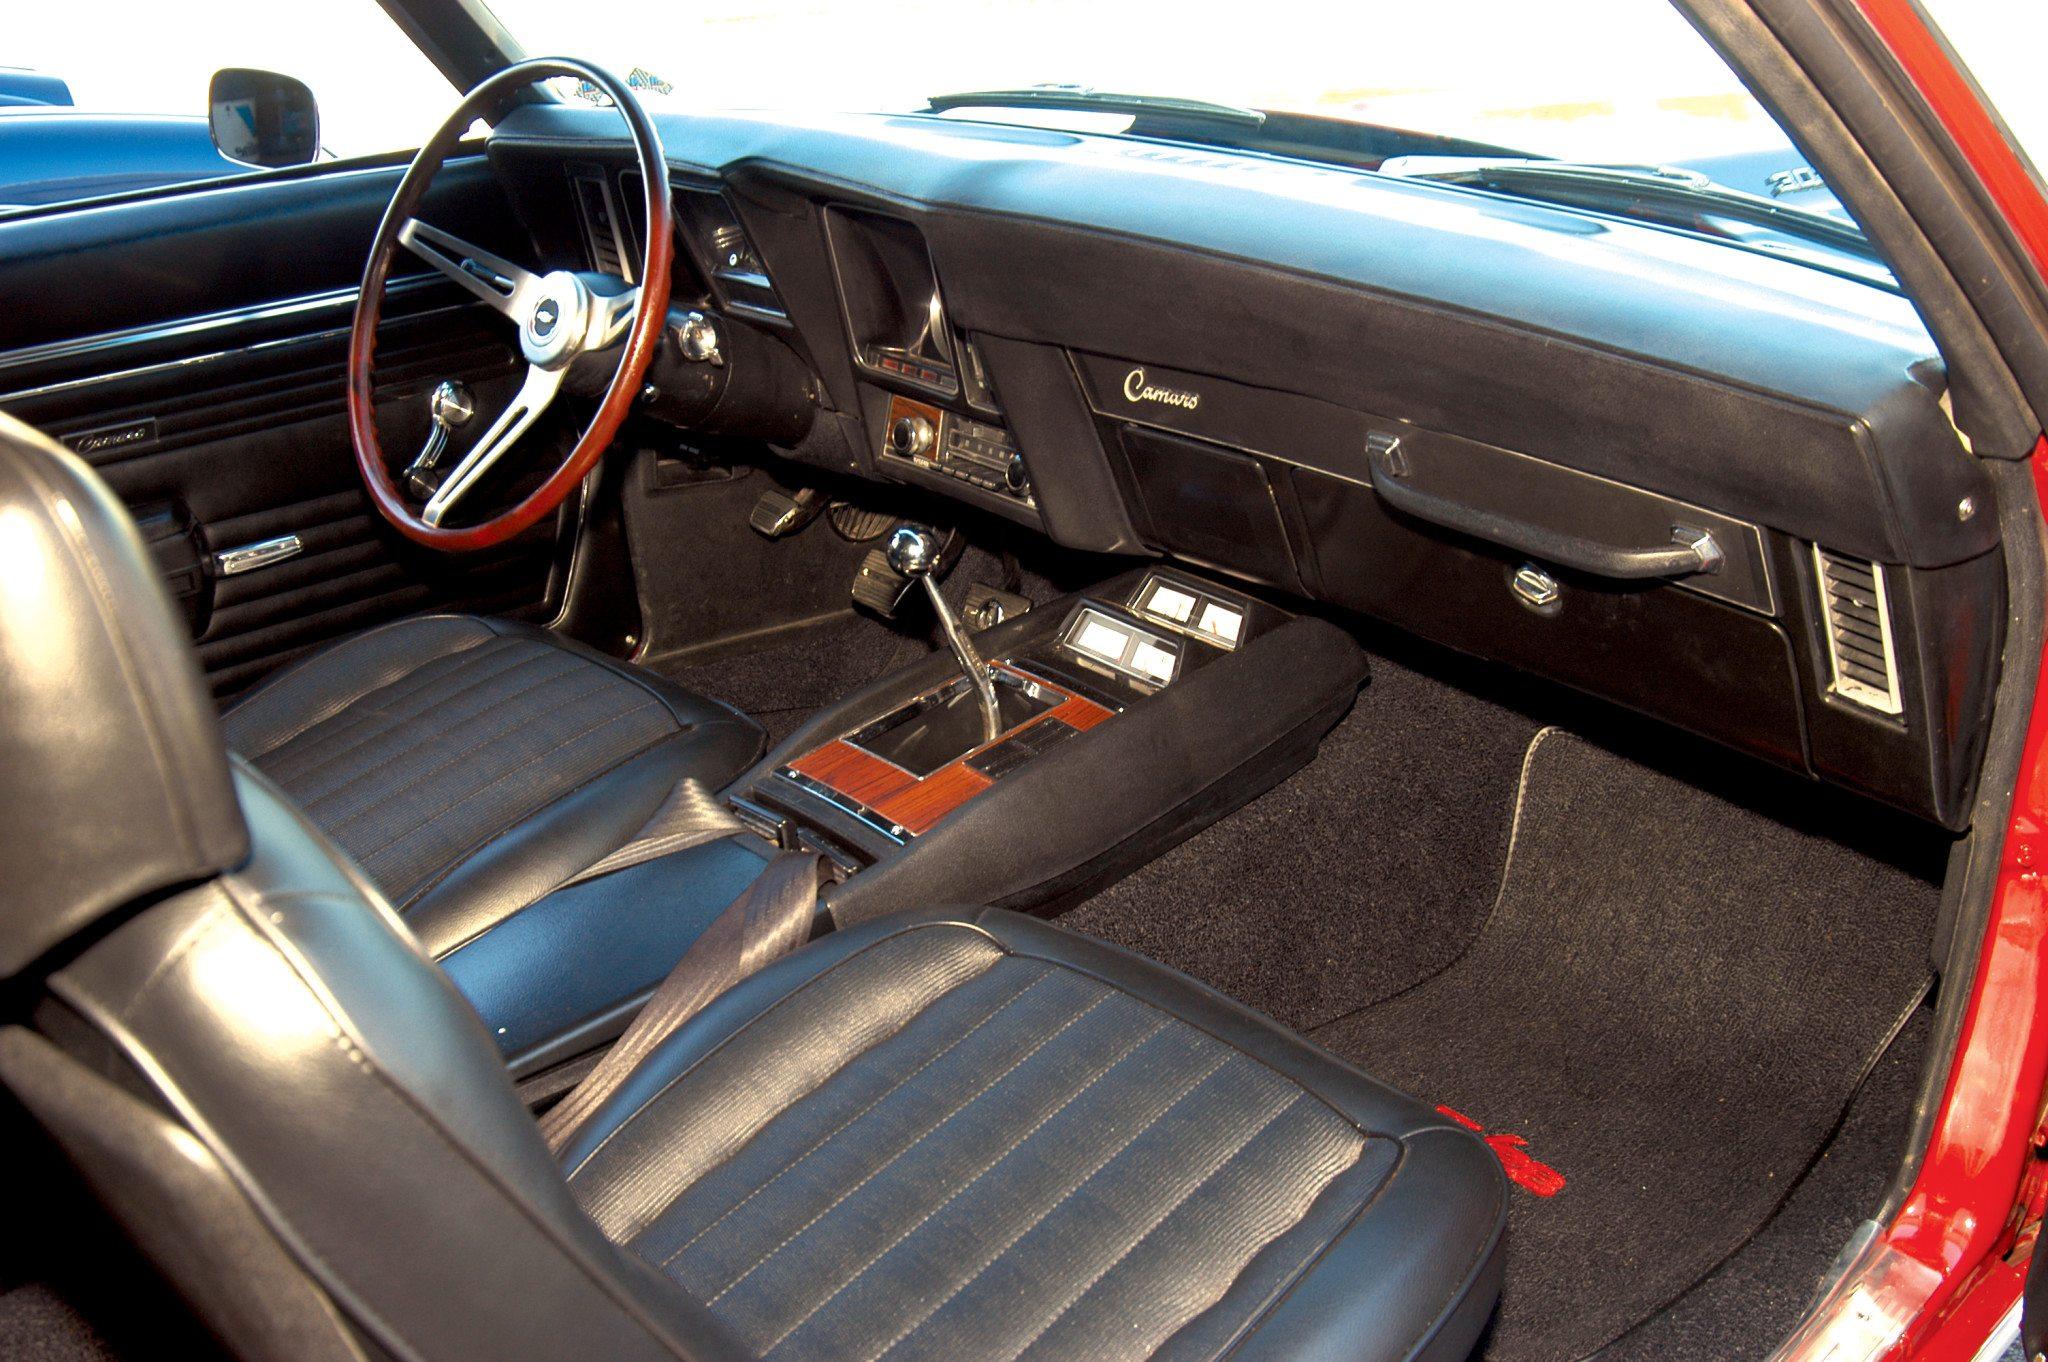 1969 Camaro Z28 Interior